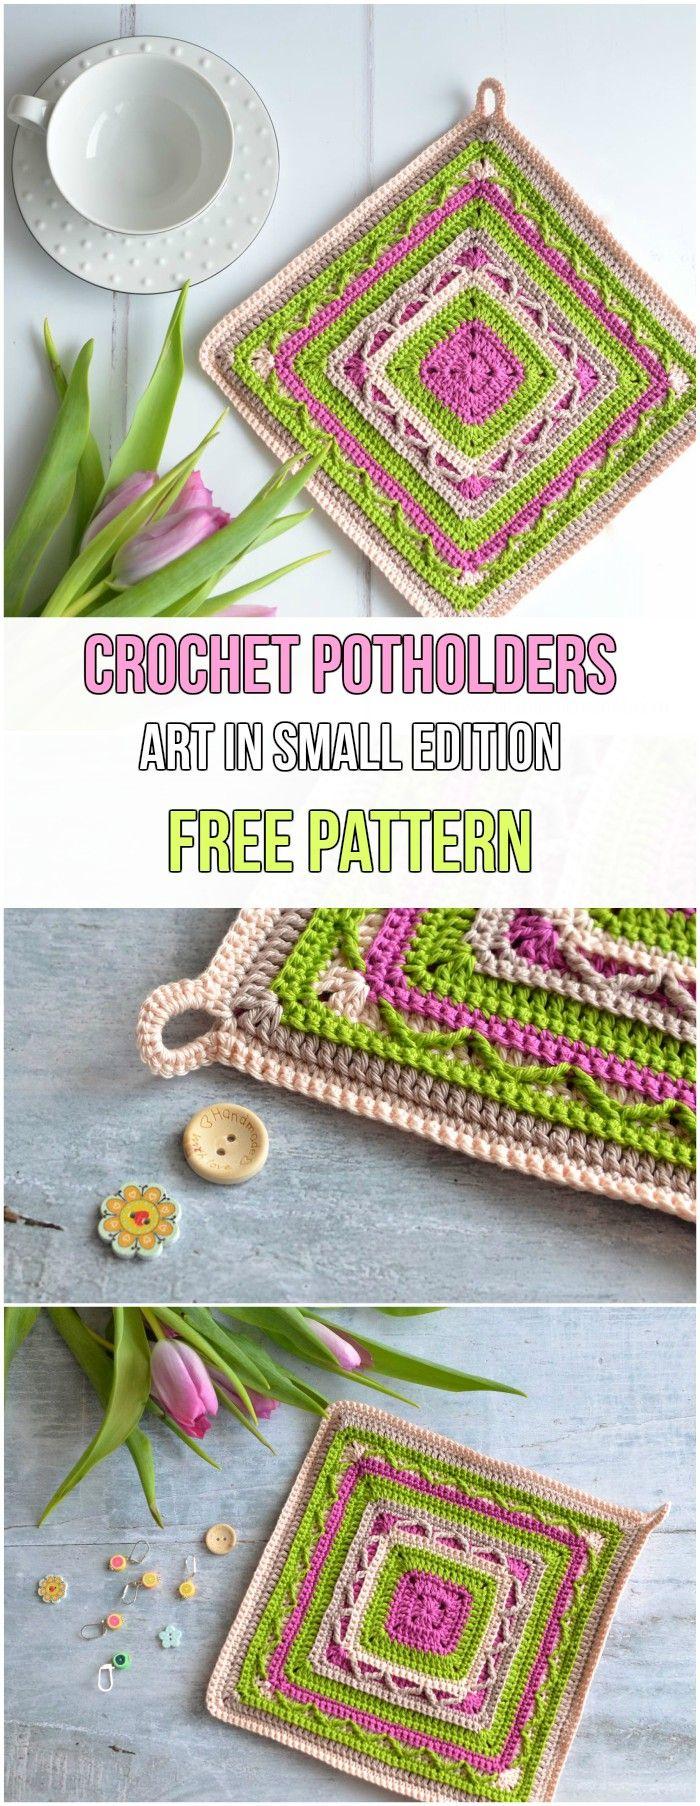 Stunning Granny Square Crochet Potholders Free Patterns   Pinterest ...